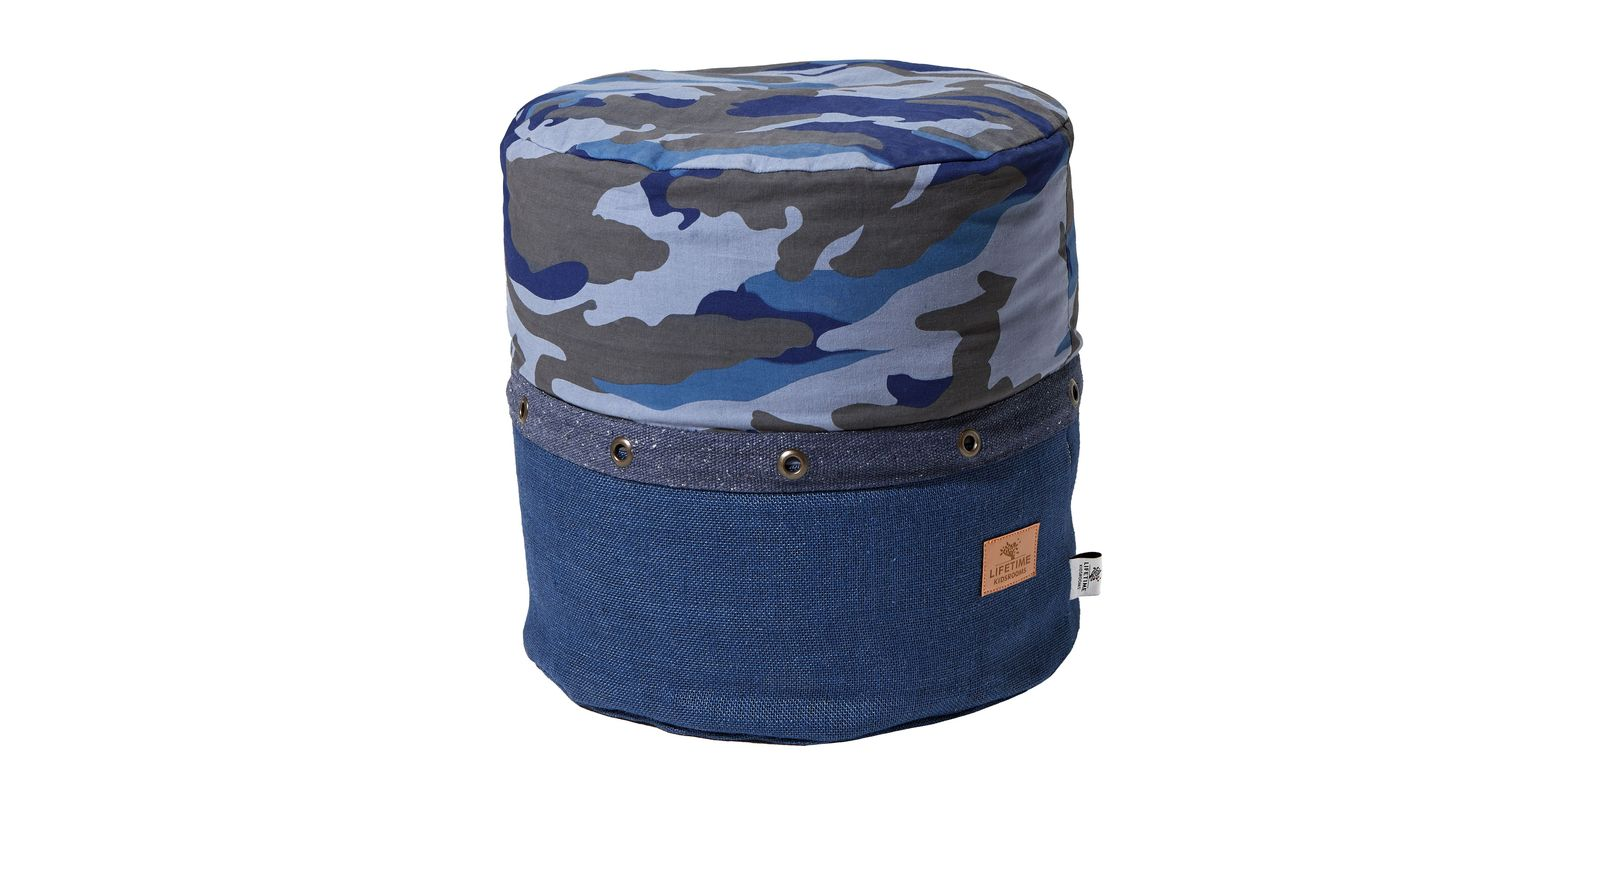 Tremdiges LIFETIME Sitzkissen Camouflage-Pouf